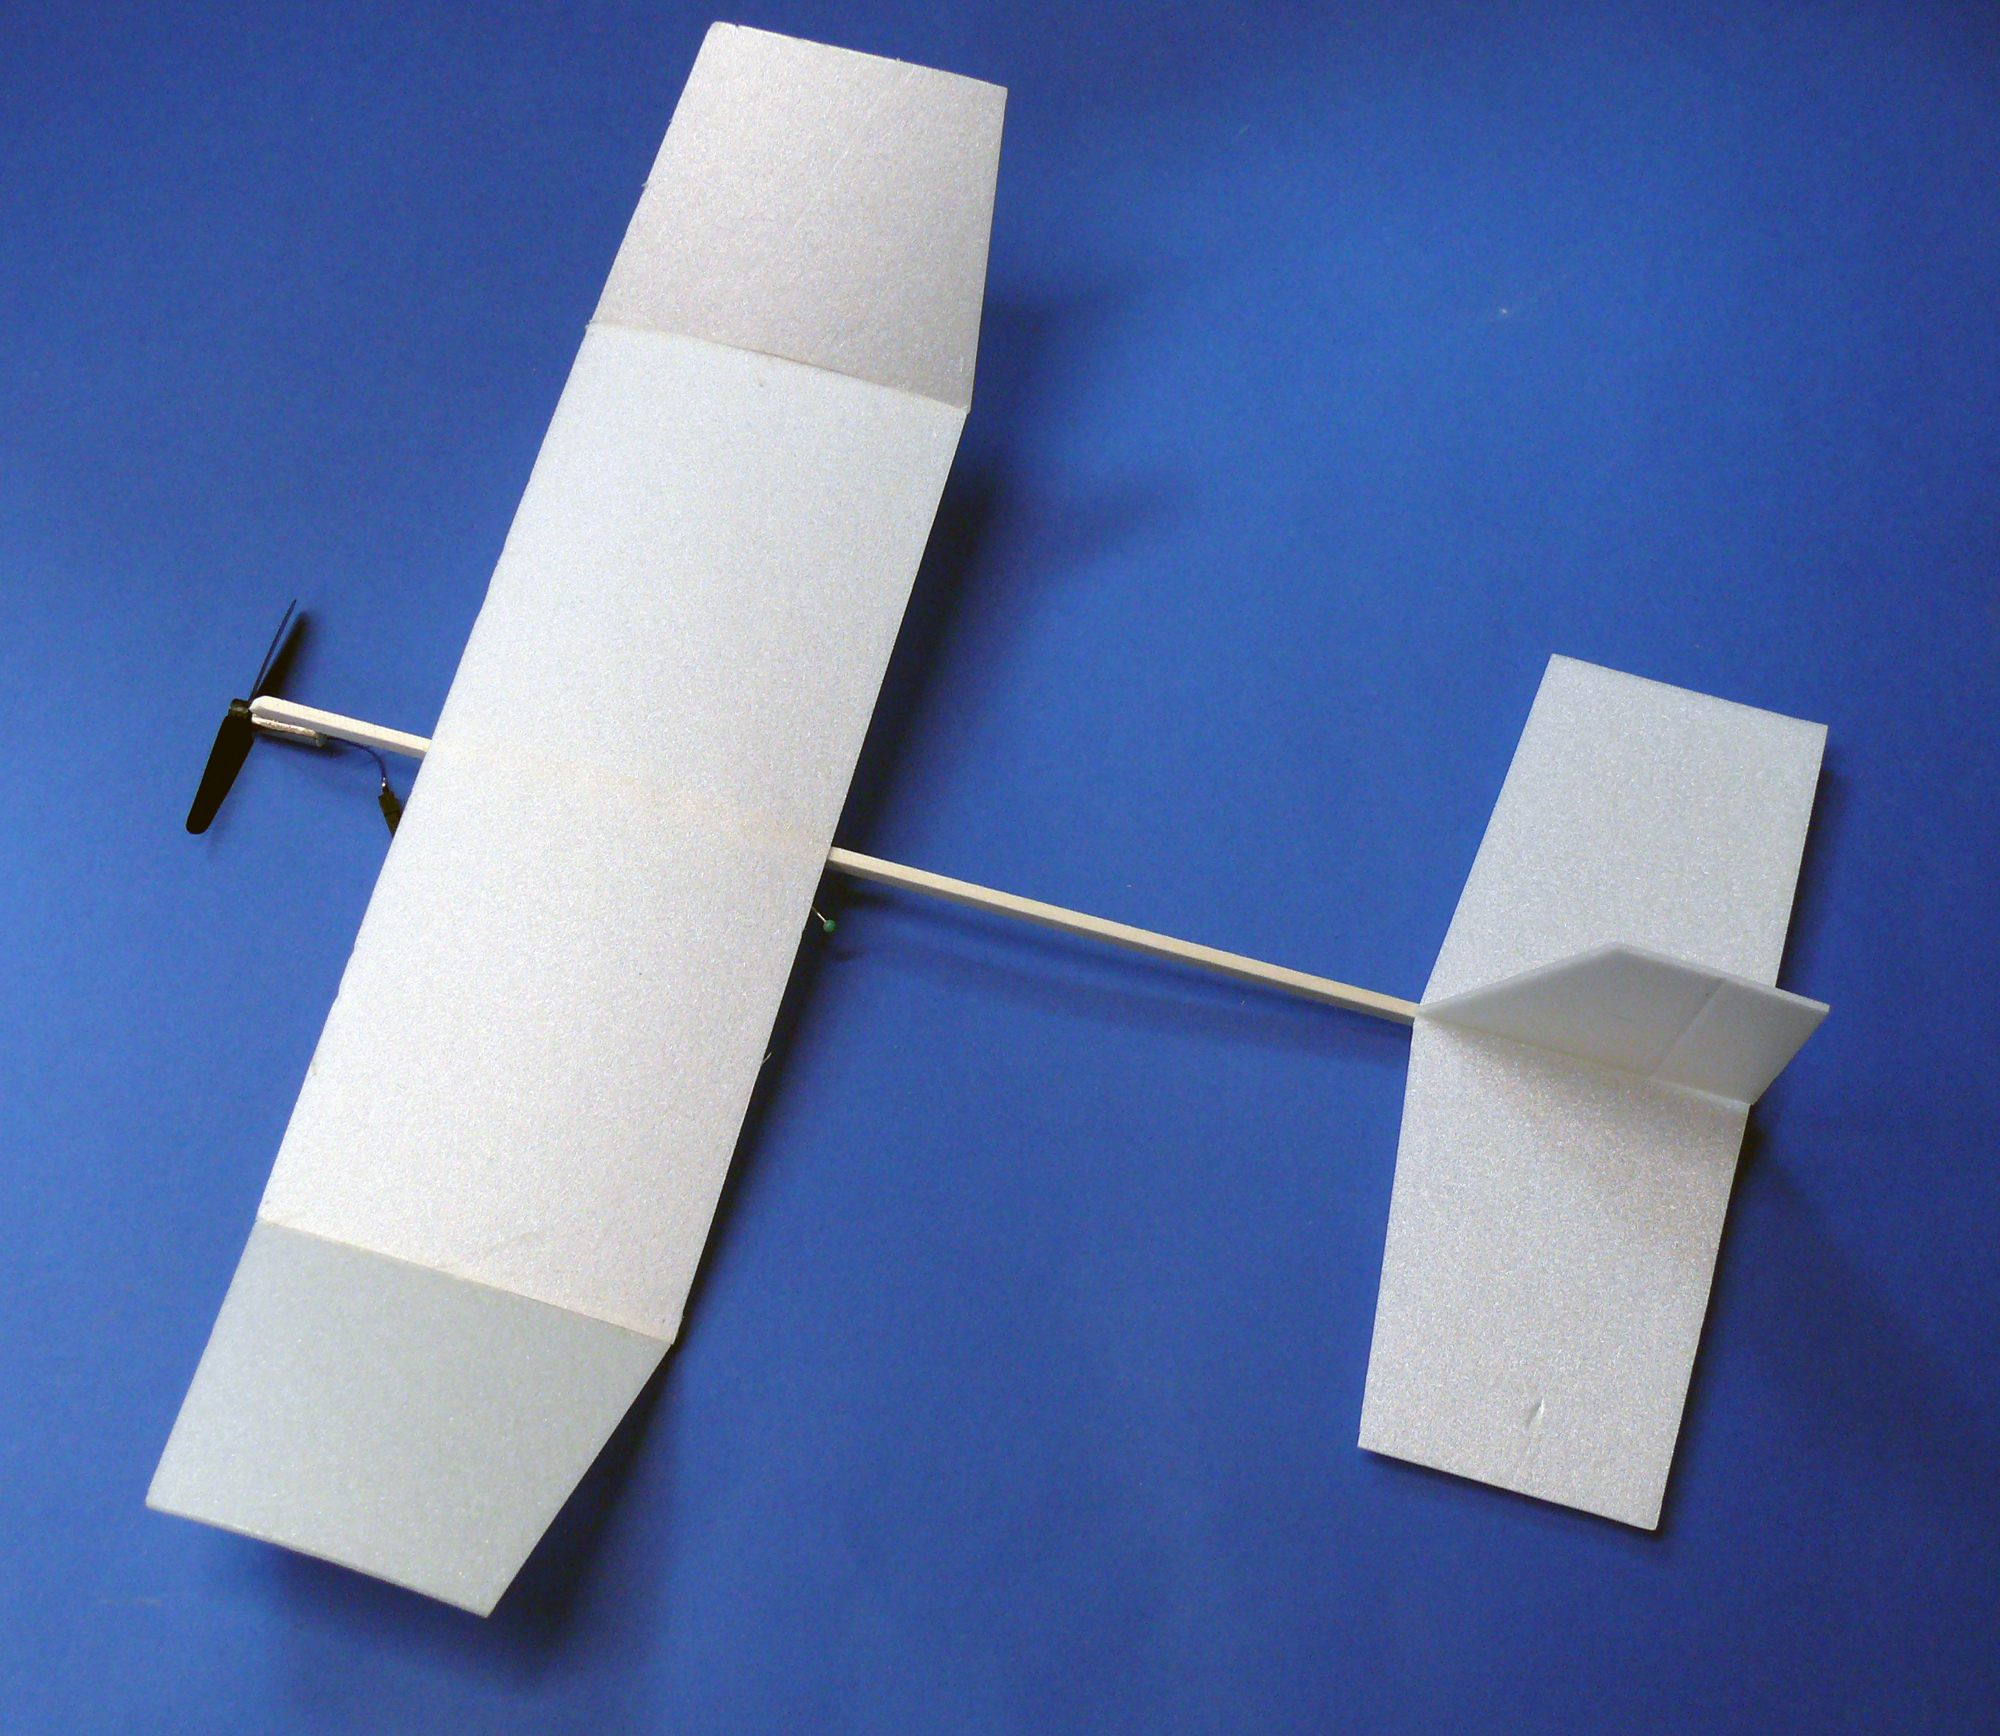 elektrisch fliegen mit der energie des super kondensators make. Black Bedroom Furniture Sets. Home Design Ideas